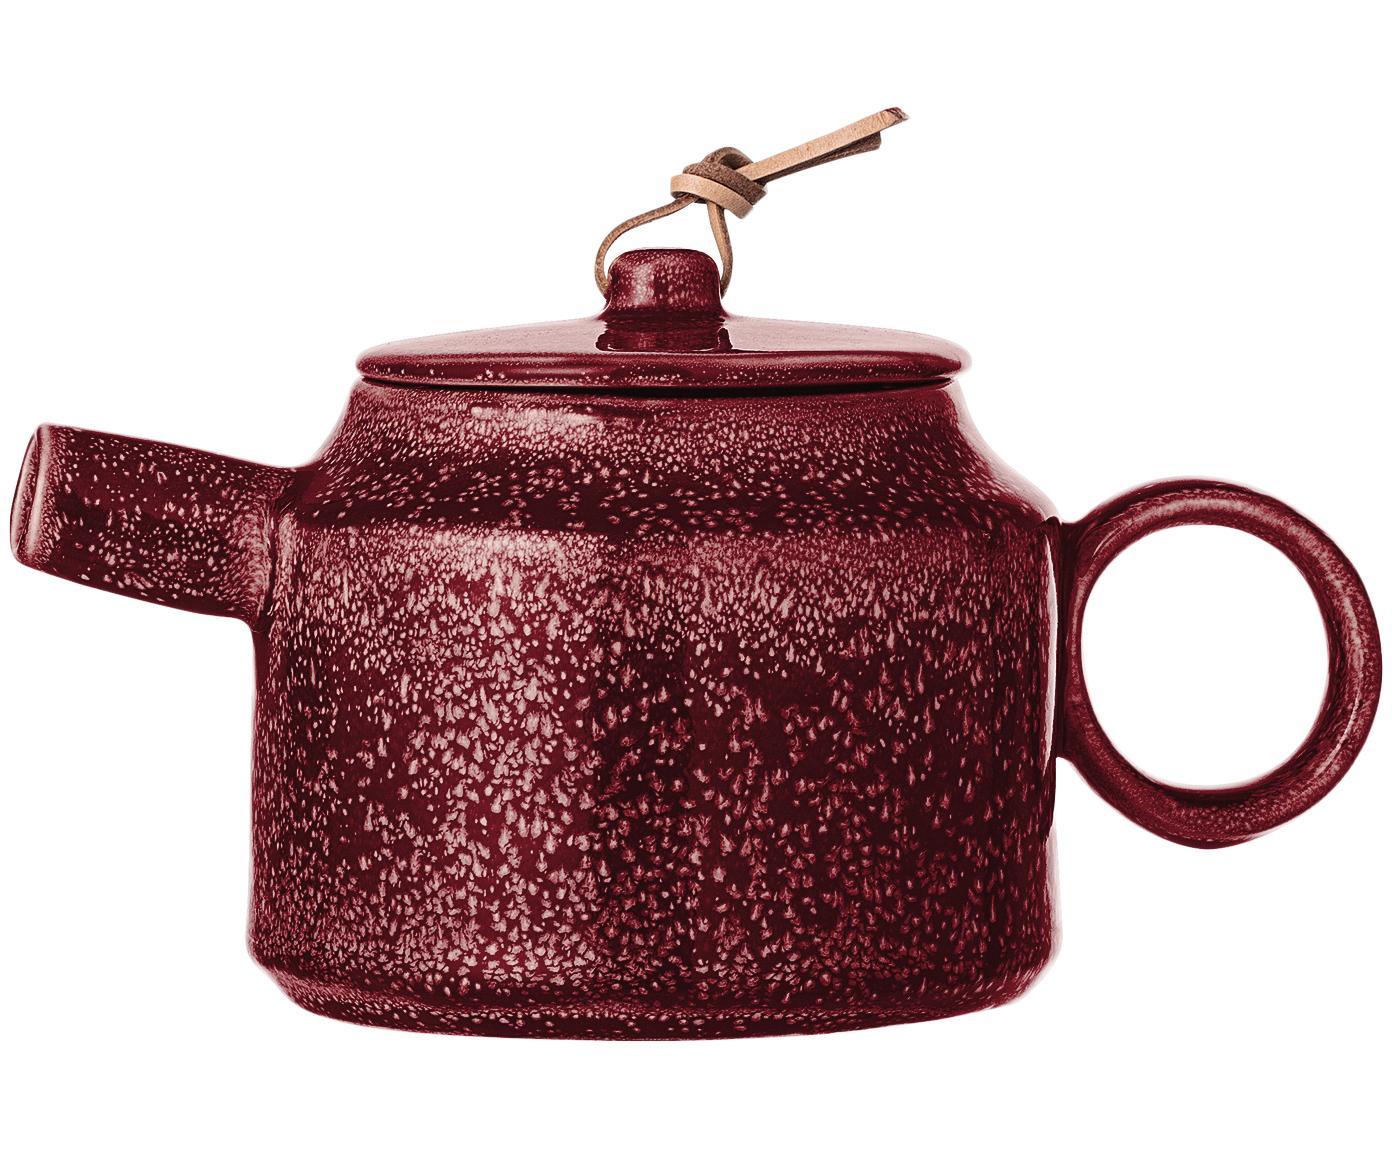 Handgemachte Teekanne Joelle, Dunkelrot, 570 ml